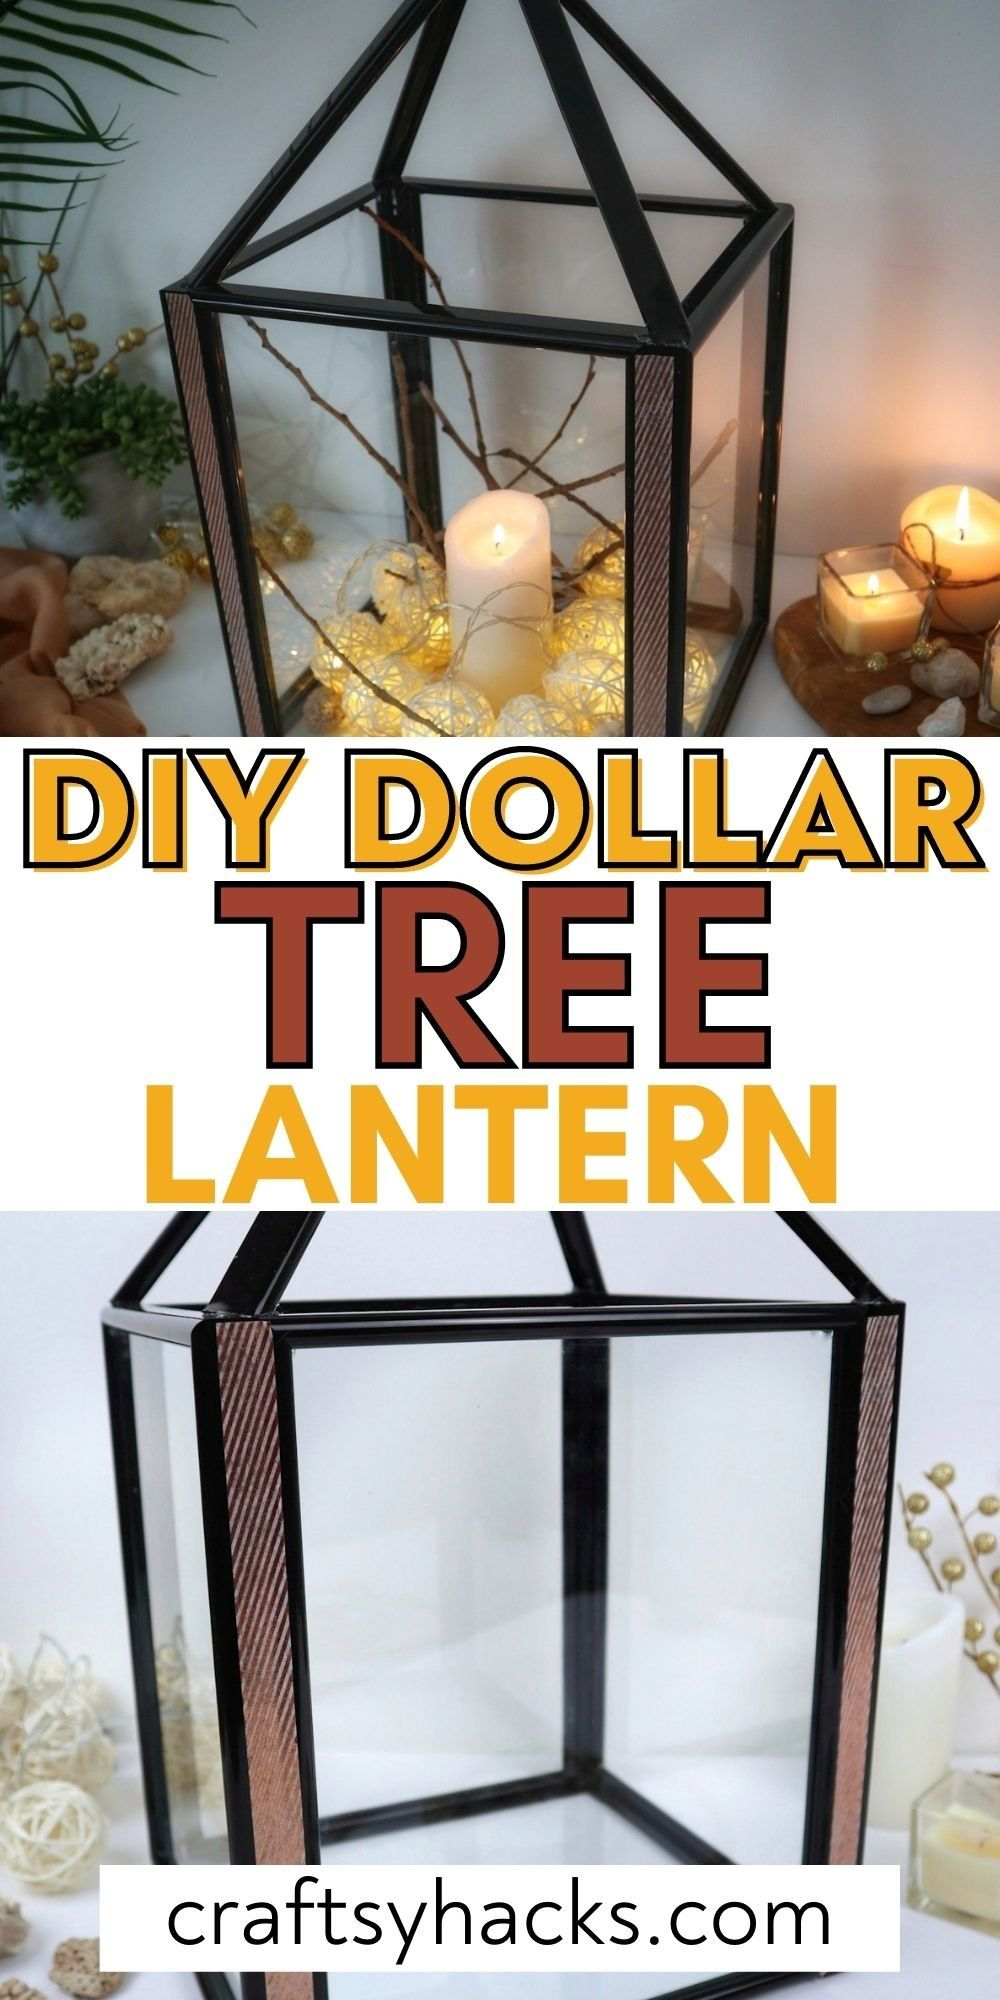 DIY dollar tree lantern